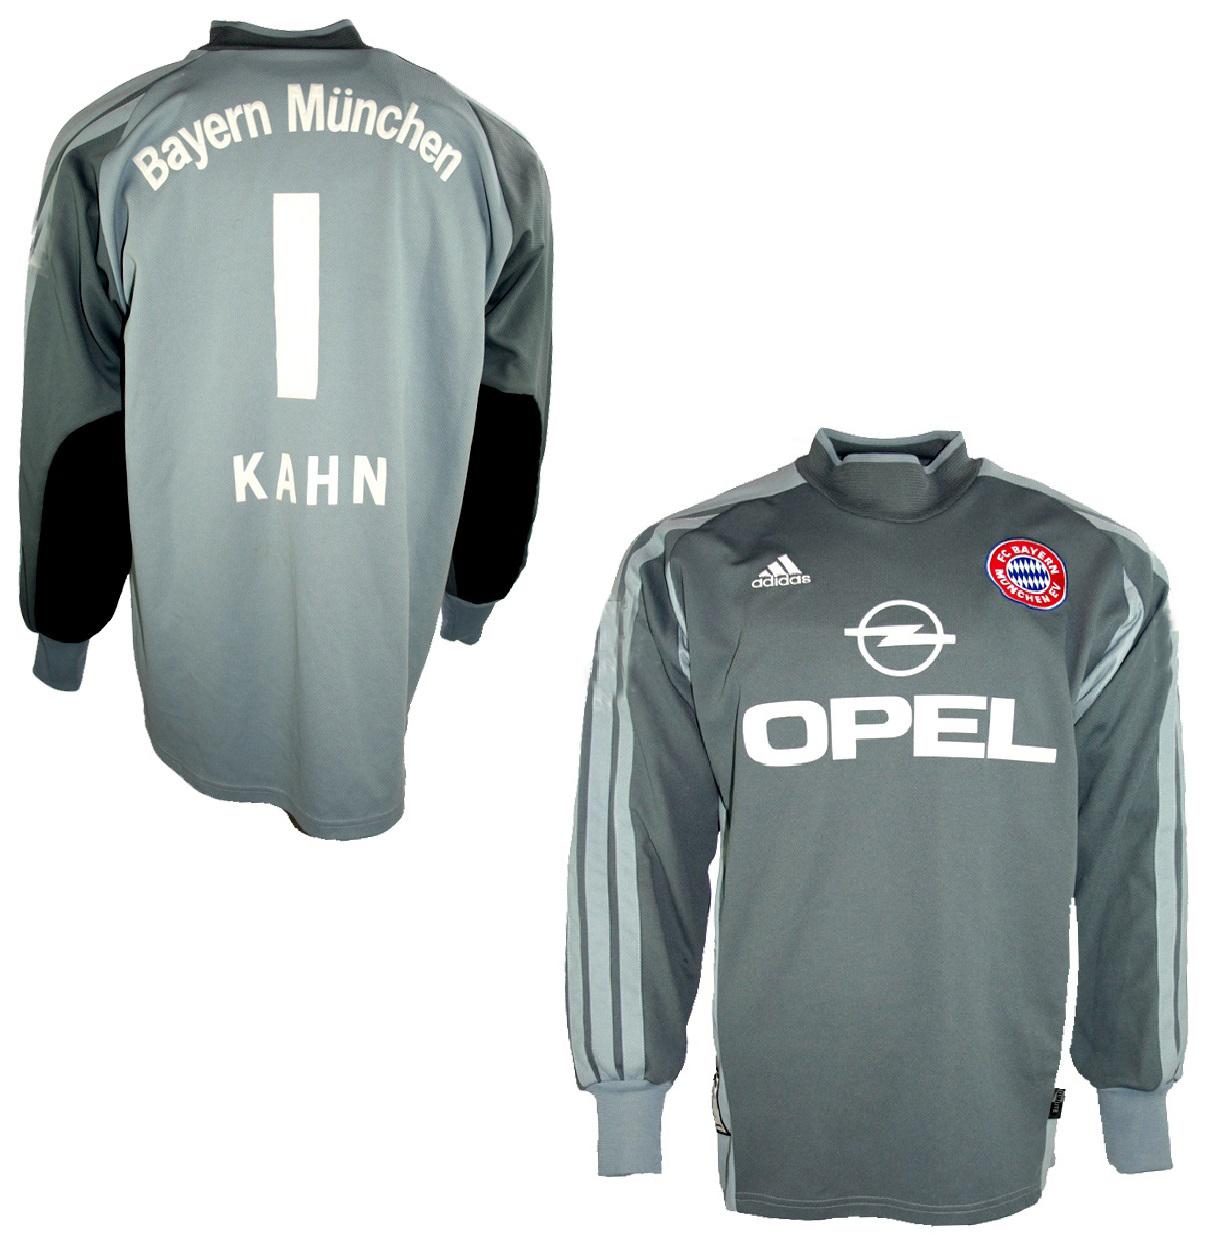 Adidas FC Bayern München Torwart Trikot 1 Oliver Kahn Opel